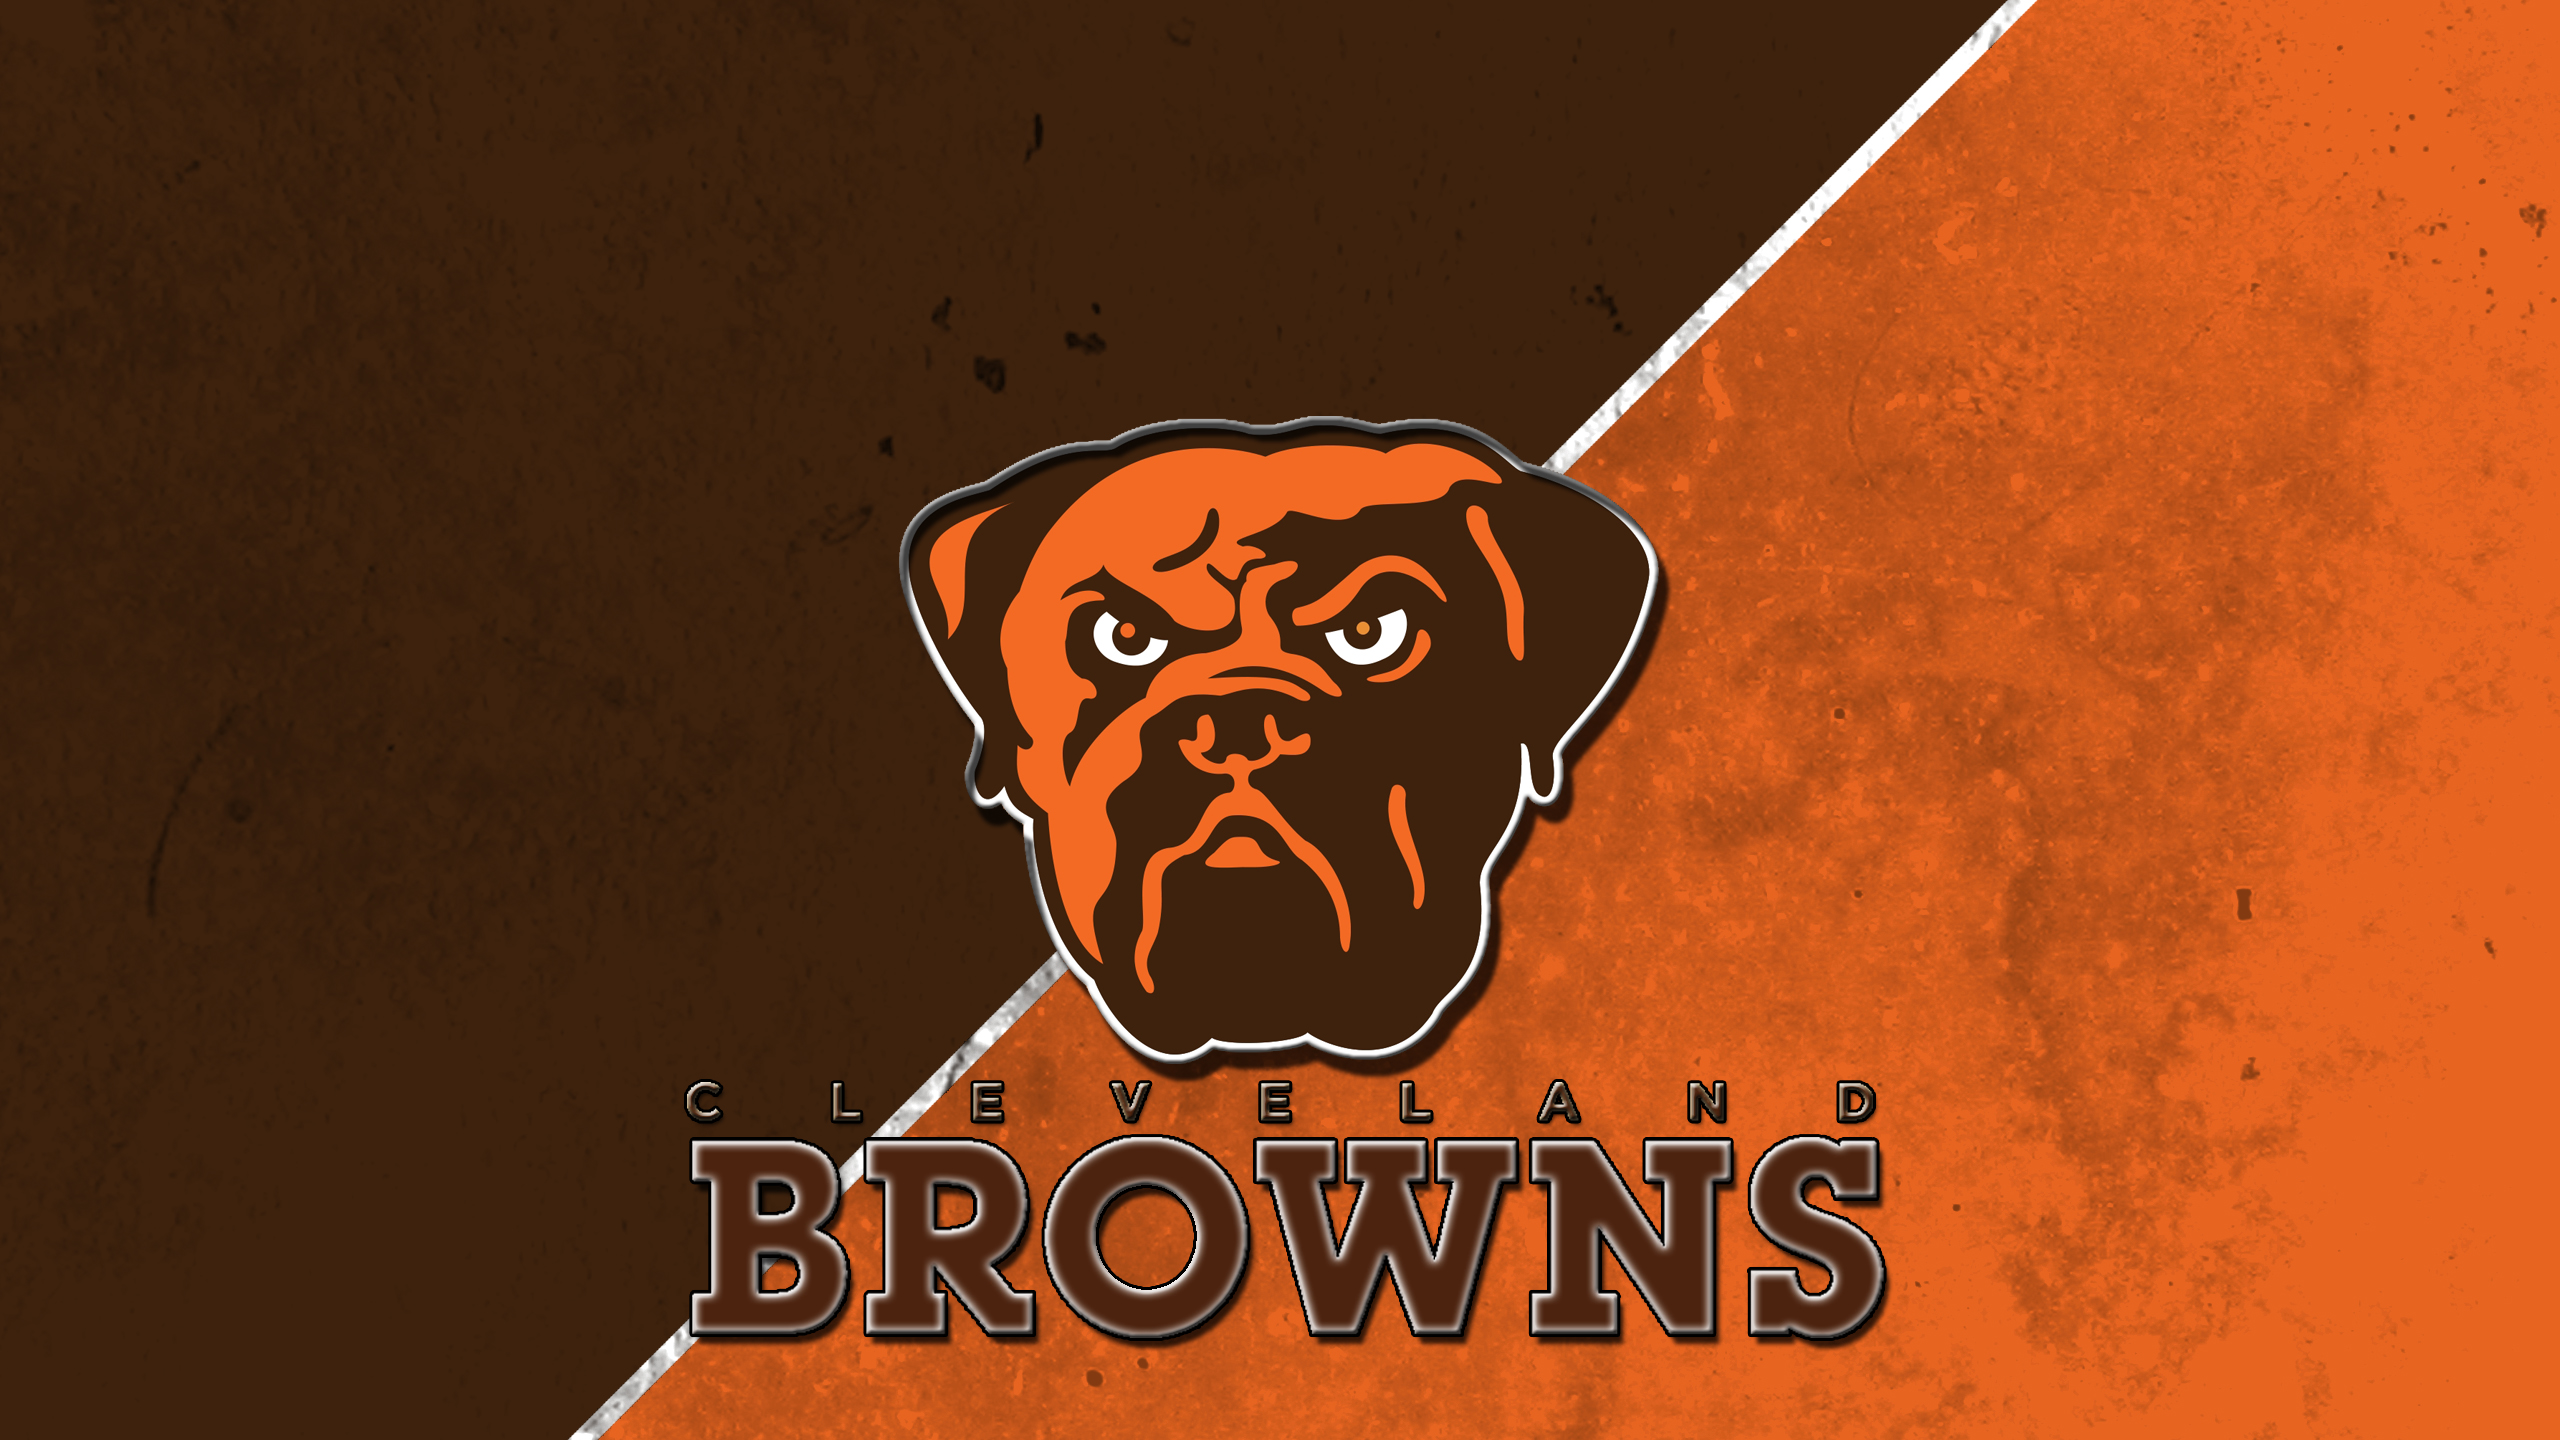 Cleveland Browns Wallpaper 2015